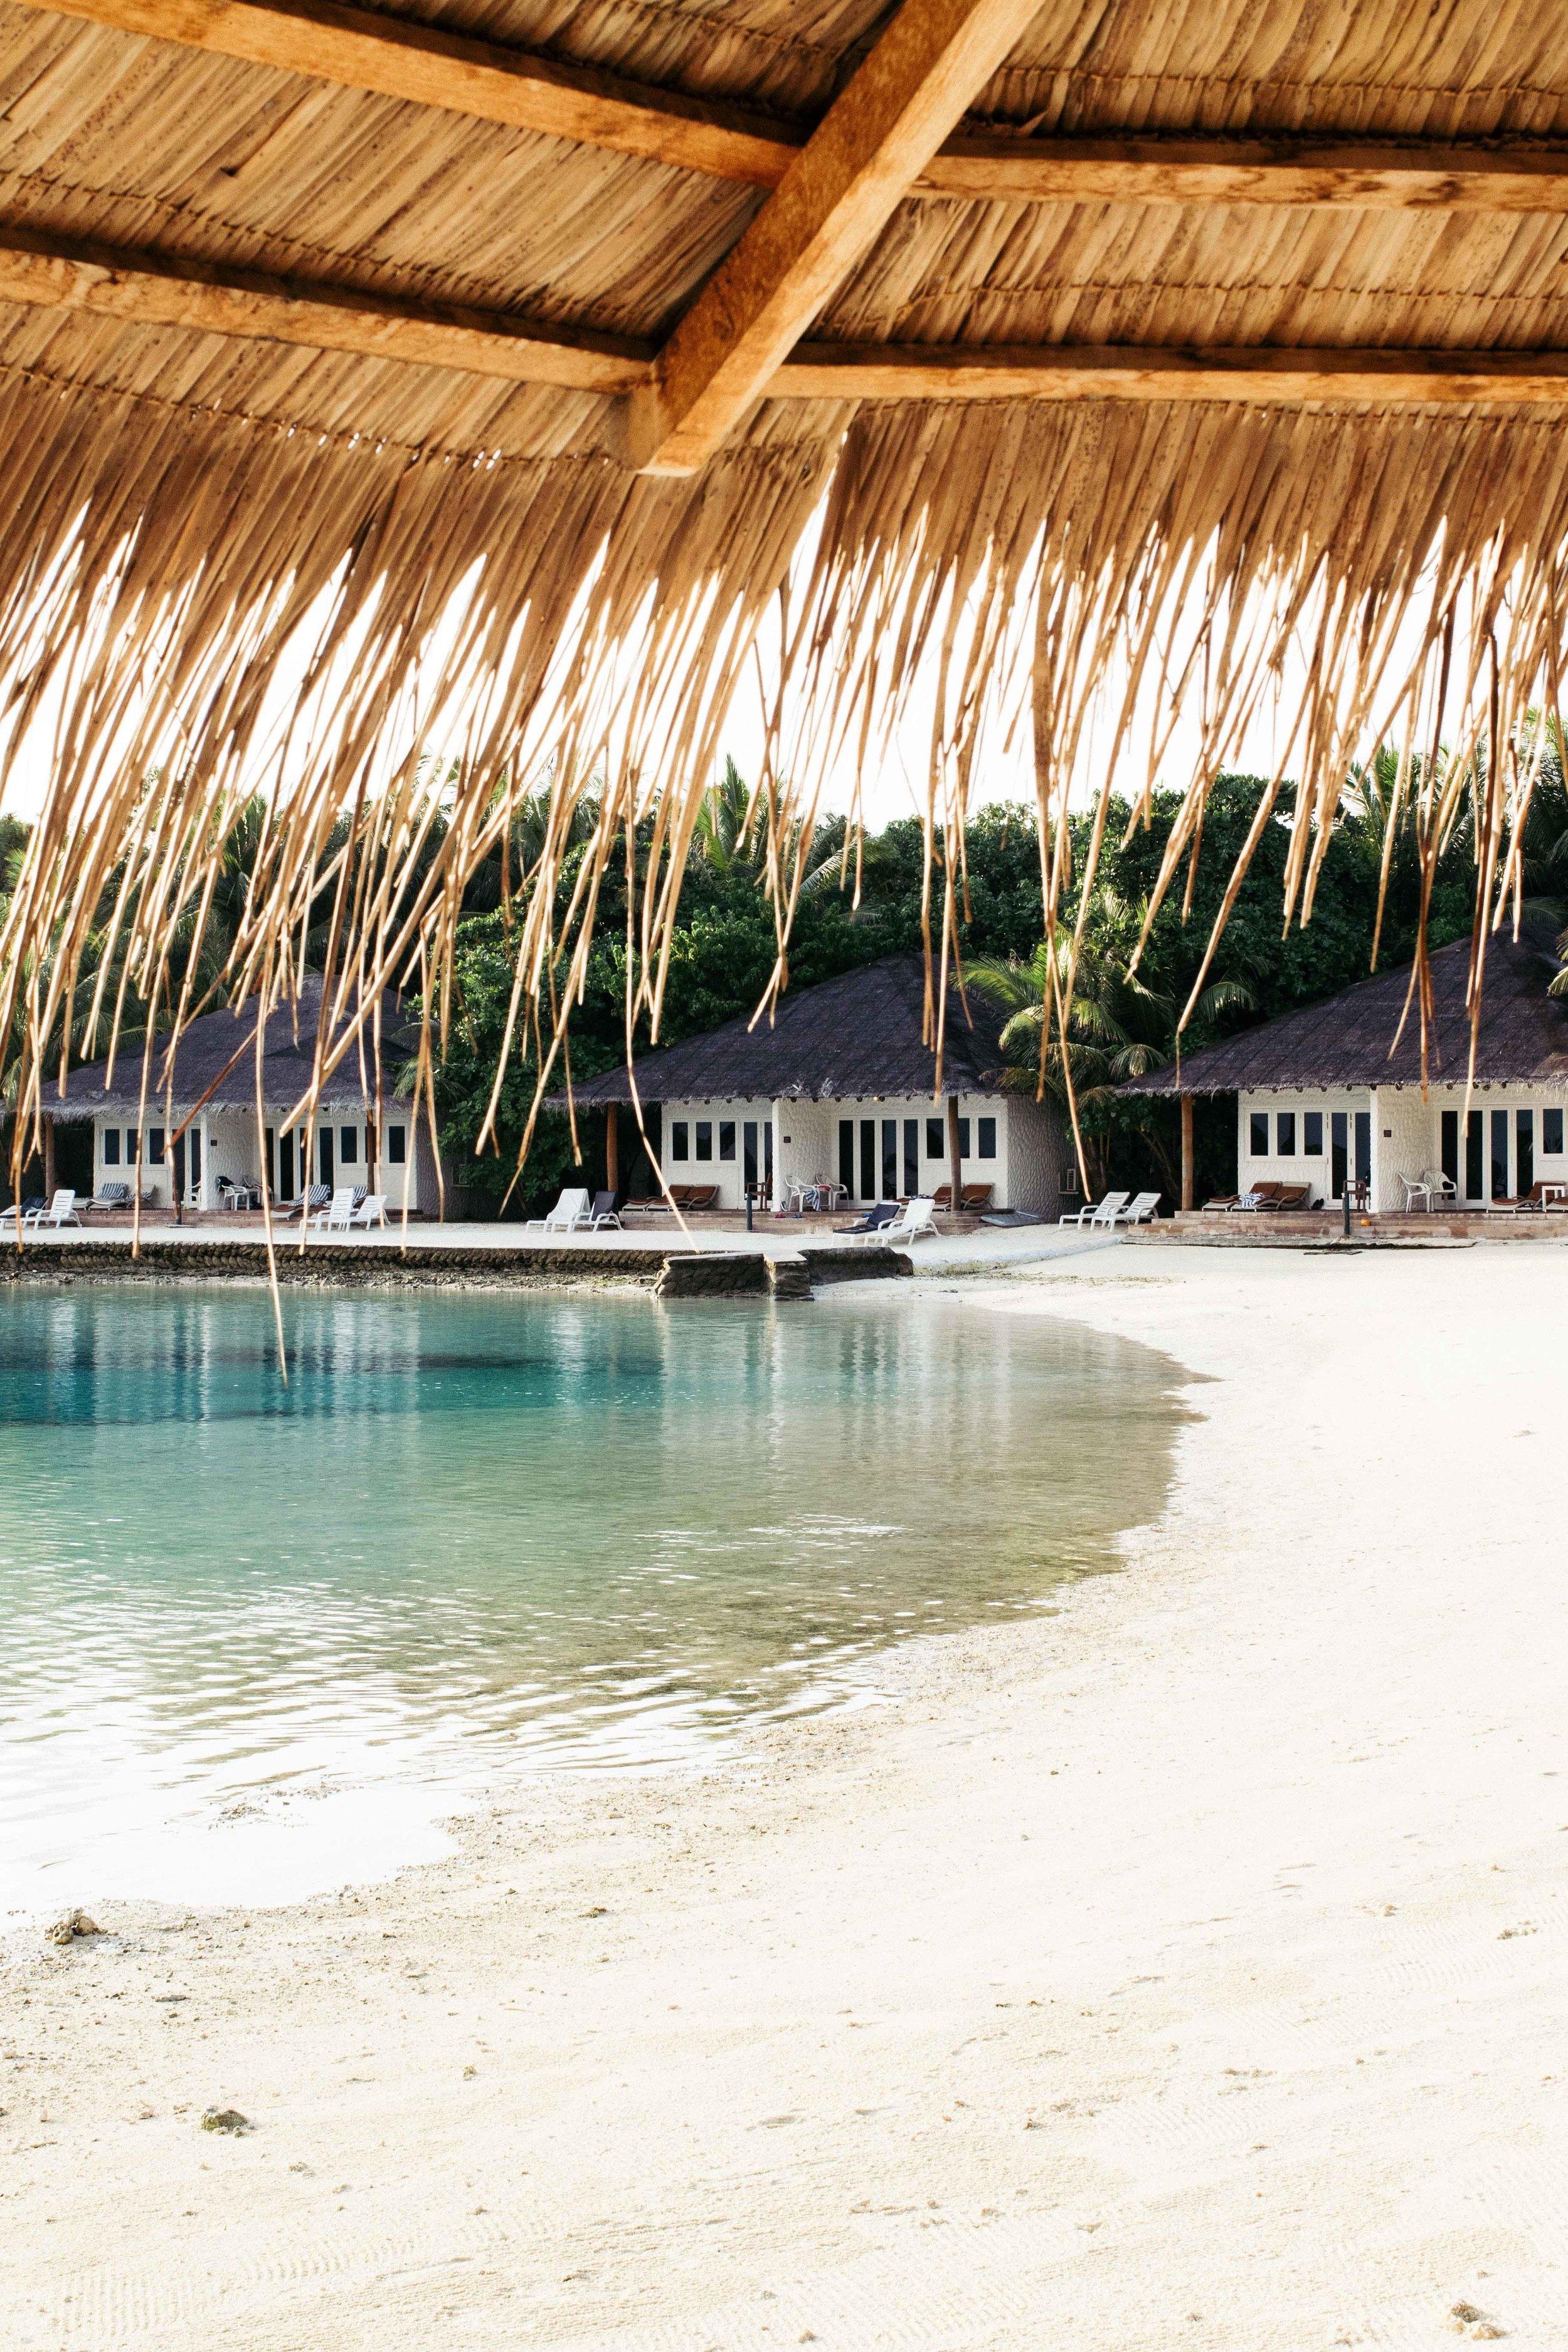 MALDIVES_CORONA_03.jpg